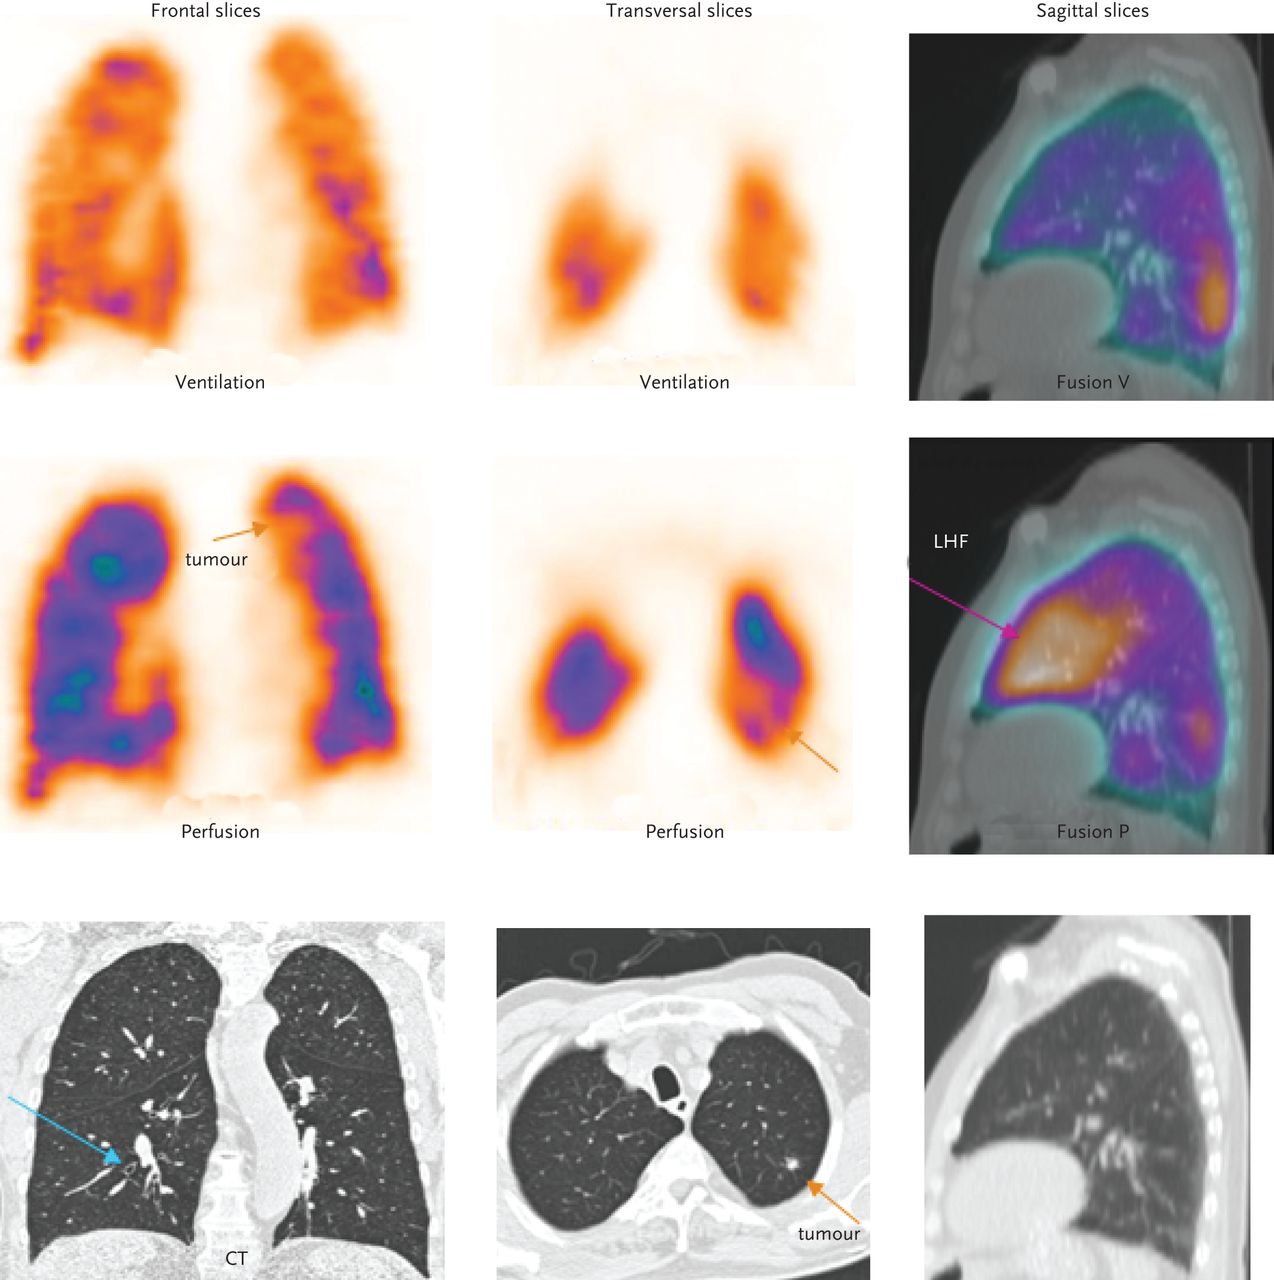 spect scan heart